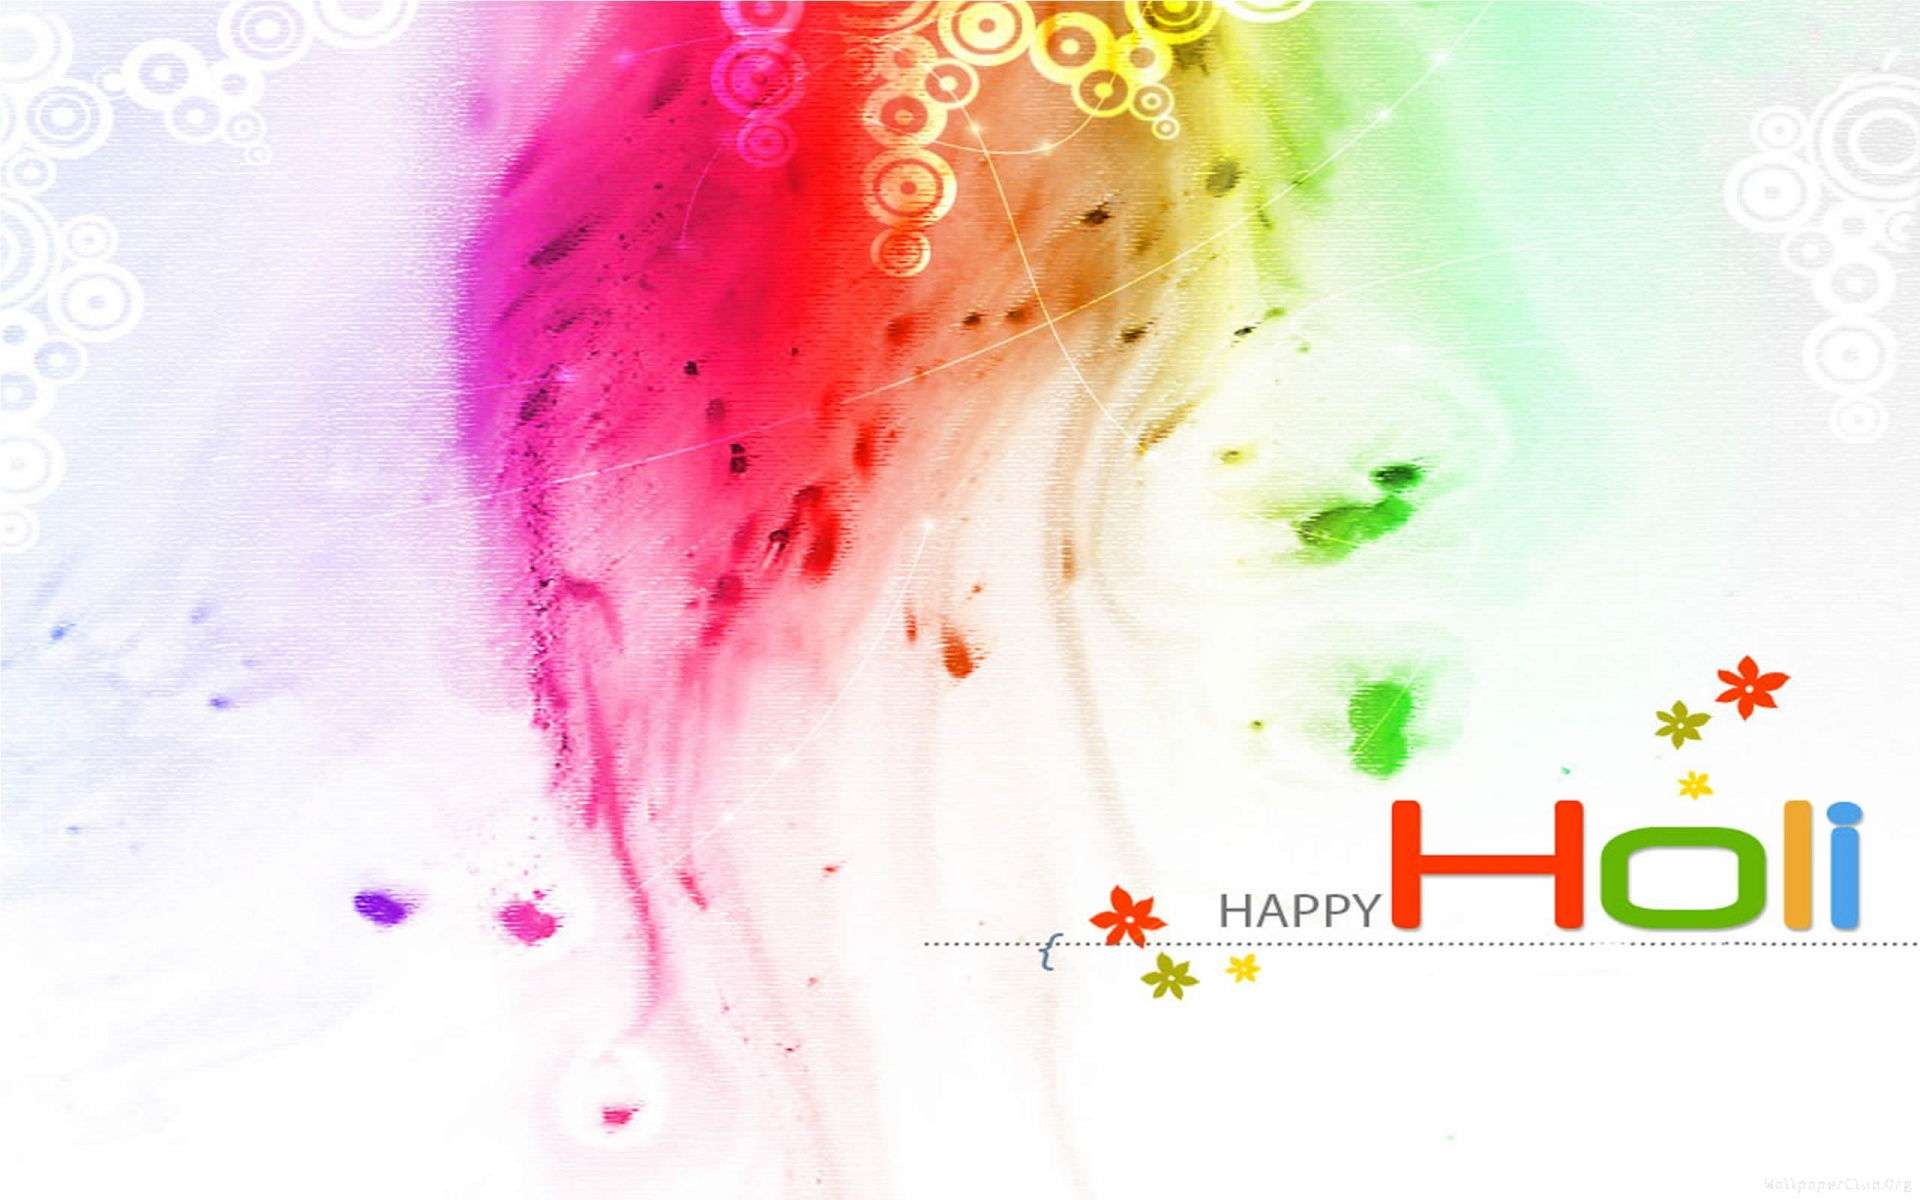 Holi Wallpaper 032